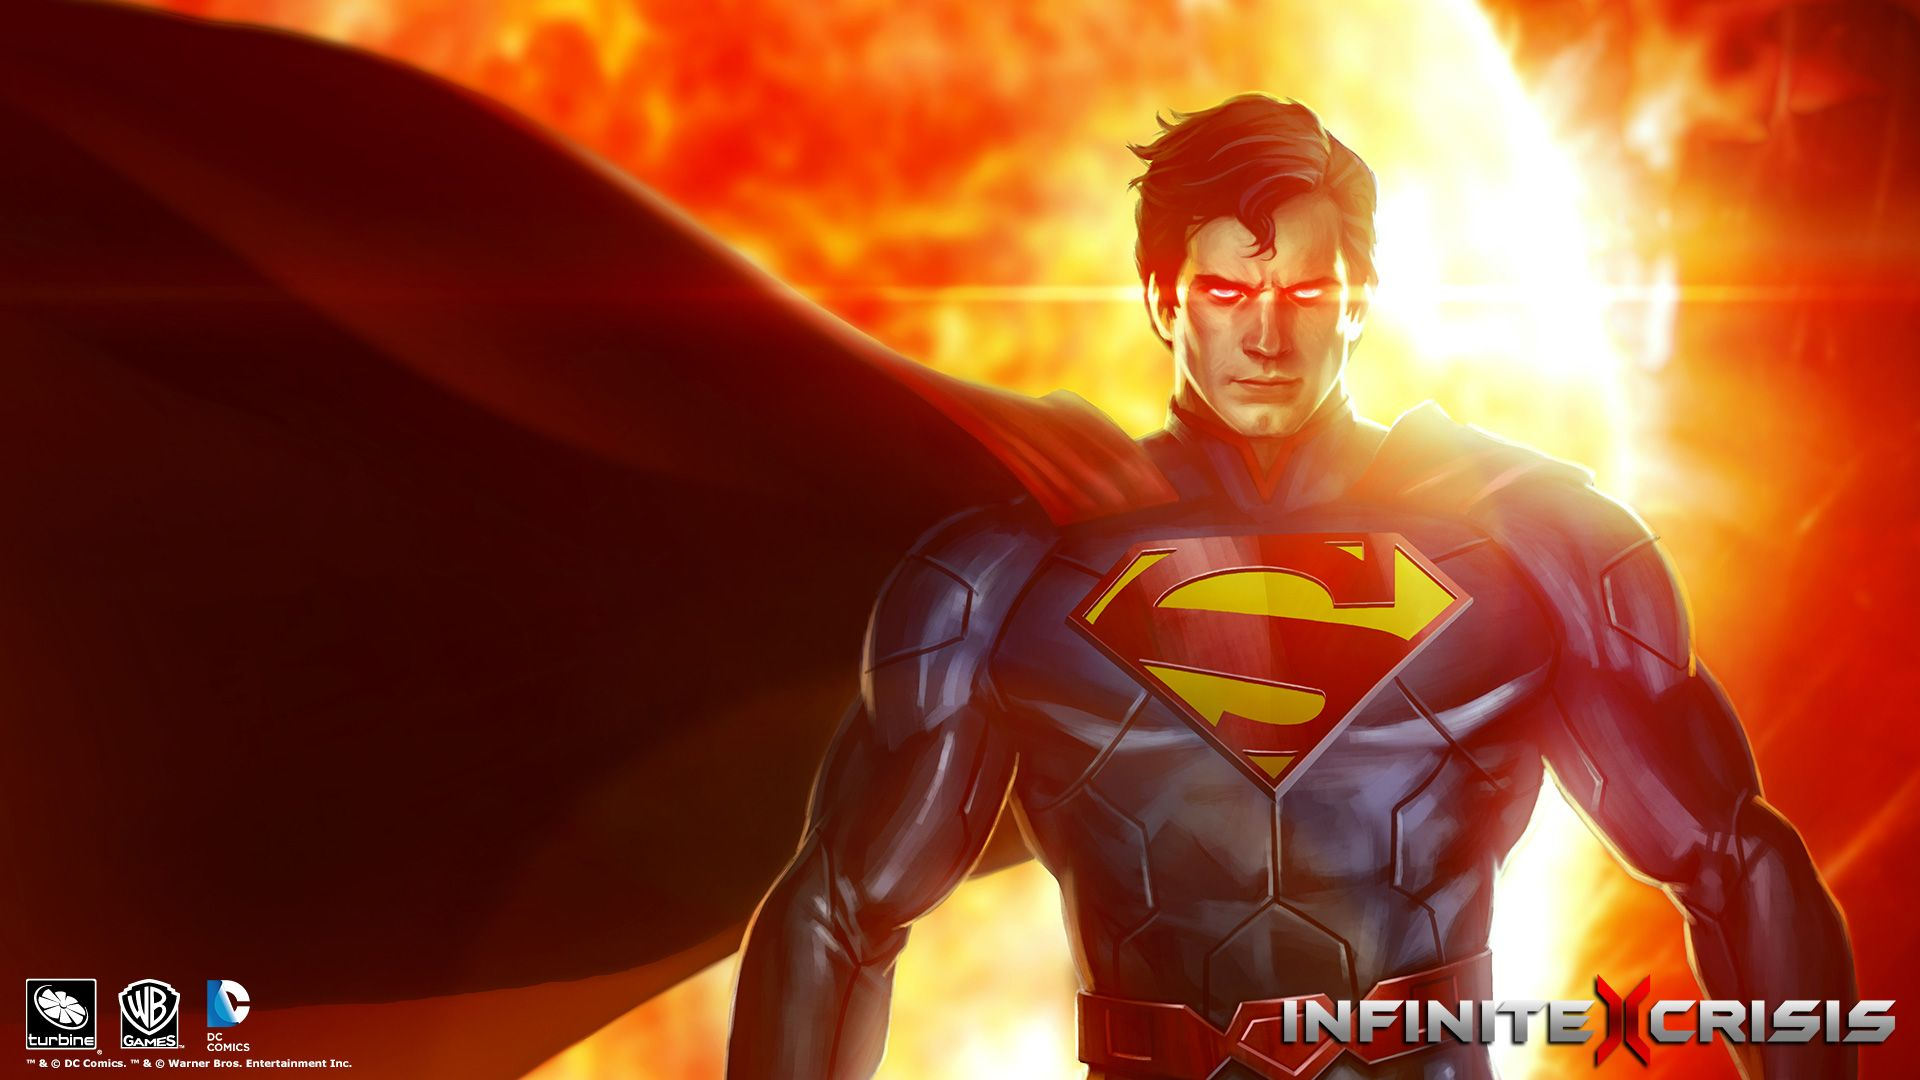 Hd wallpaper superman - Best 25 Superman Hd Wallpaper Ideas On Pinterest Superman Logo Superman Logo Wallpaper And Superman Logo Art